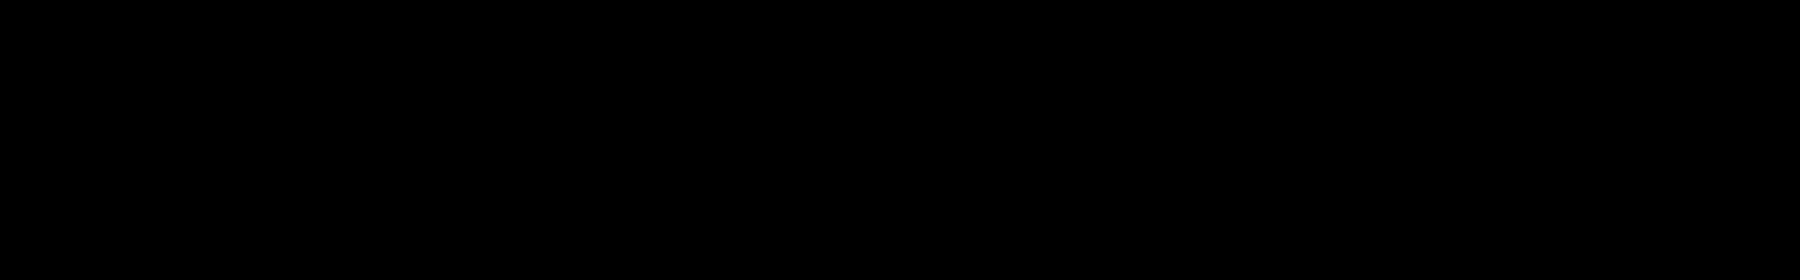 RAWCUTZ audio waveform